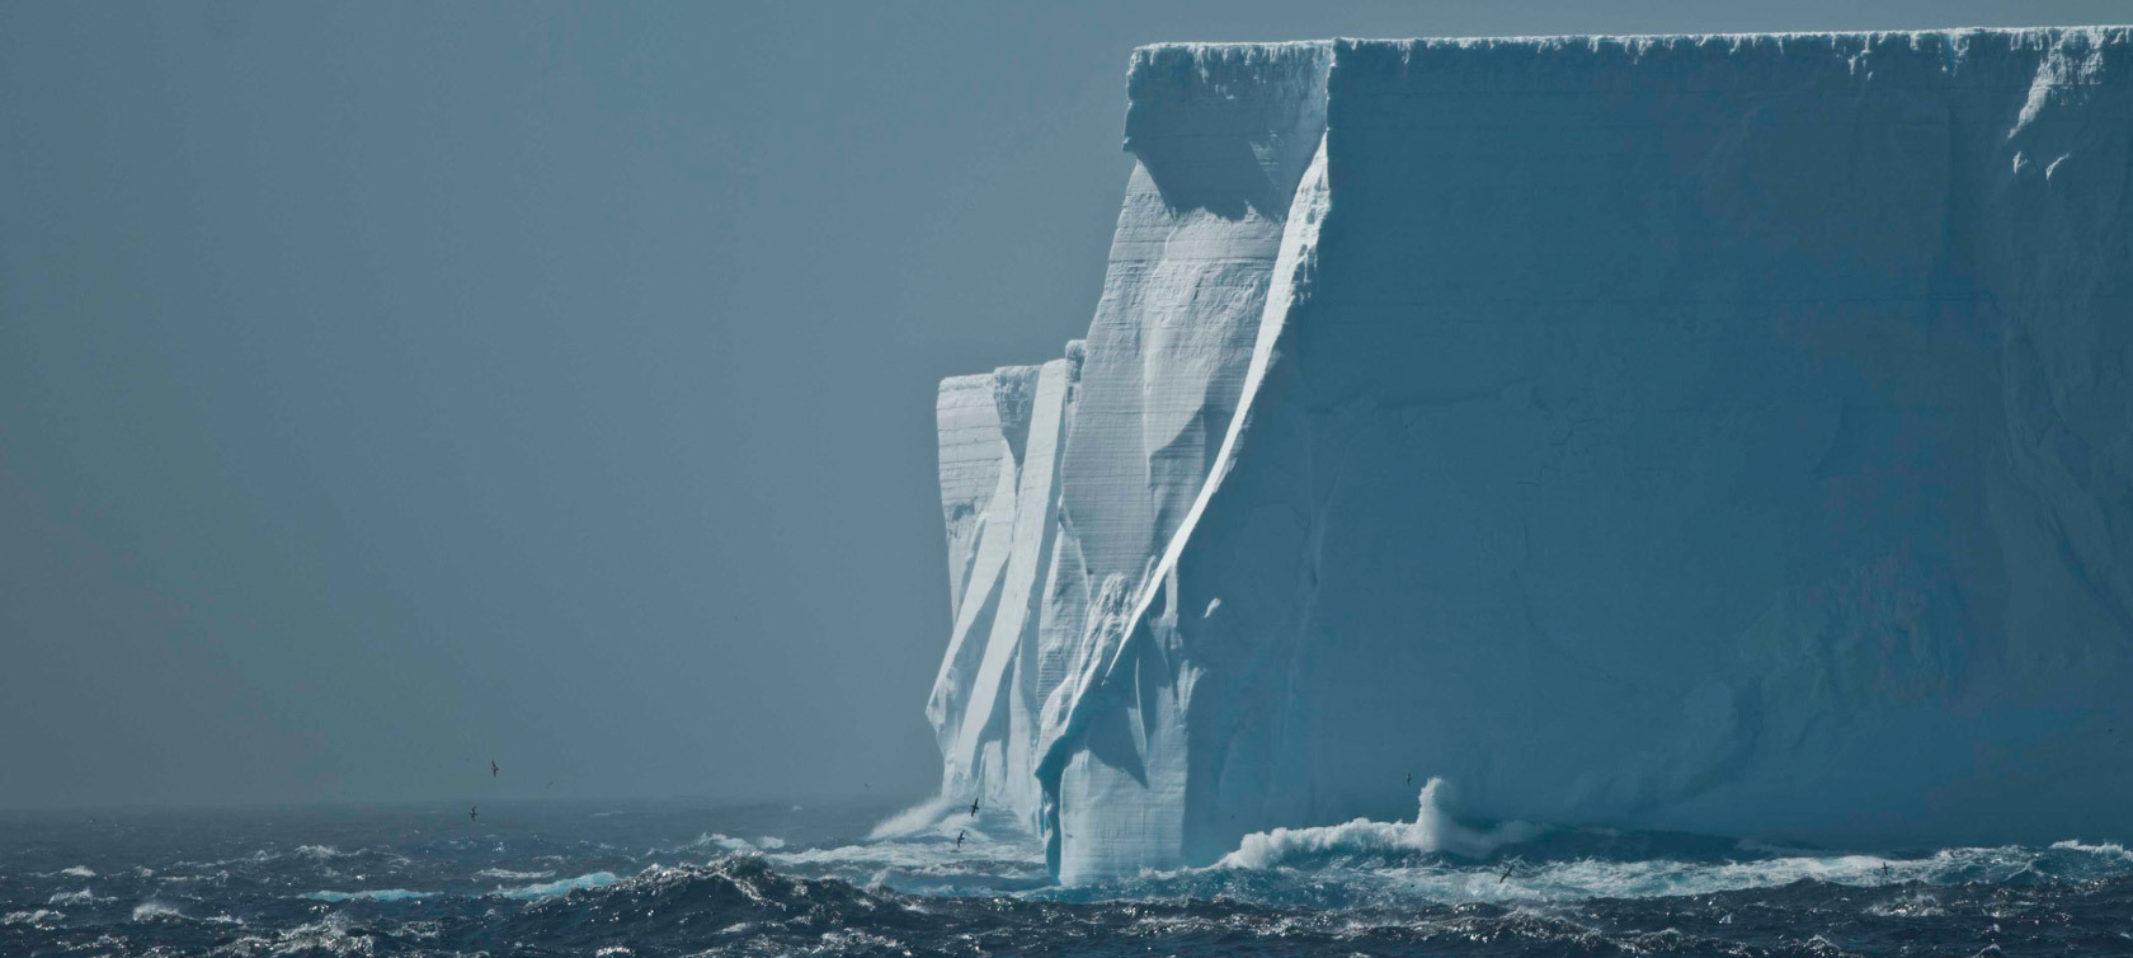 Antarctica, South Georgia & the Falkland Islands Trip Log  (12 - 28 Dec 2017)  – Friday, Dec 22 thumbnail image